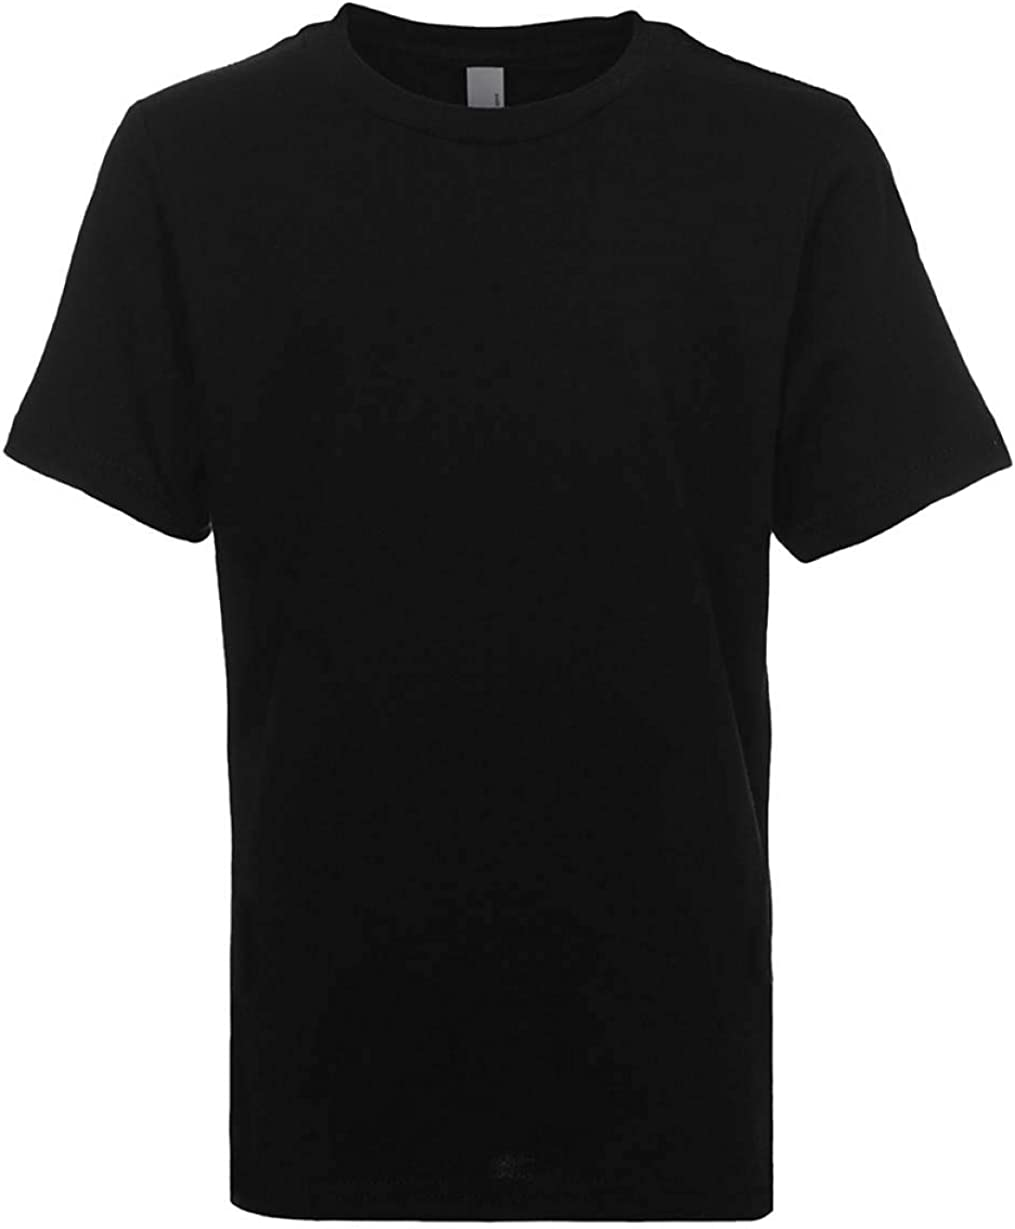 Next Level Kids Crew Neck T-Shirt Black S